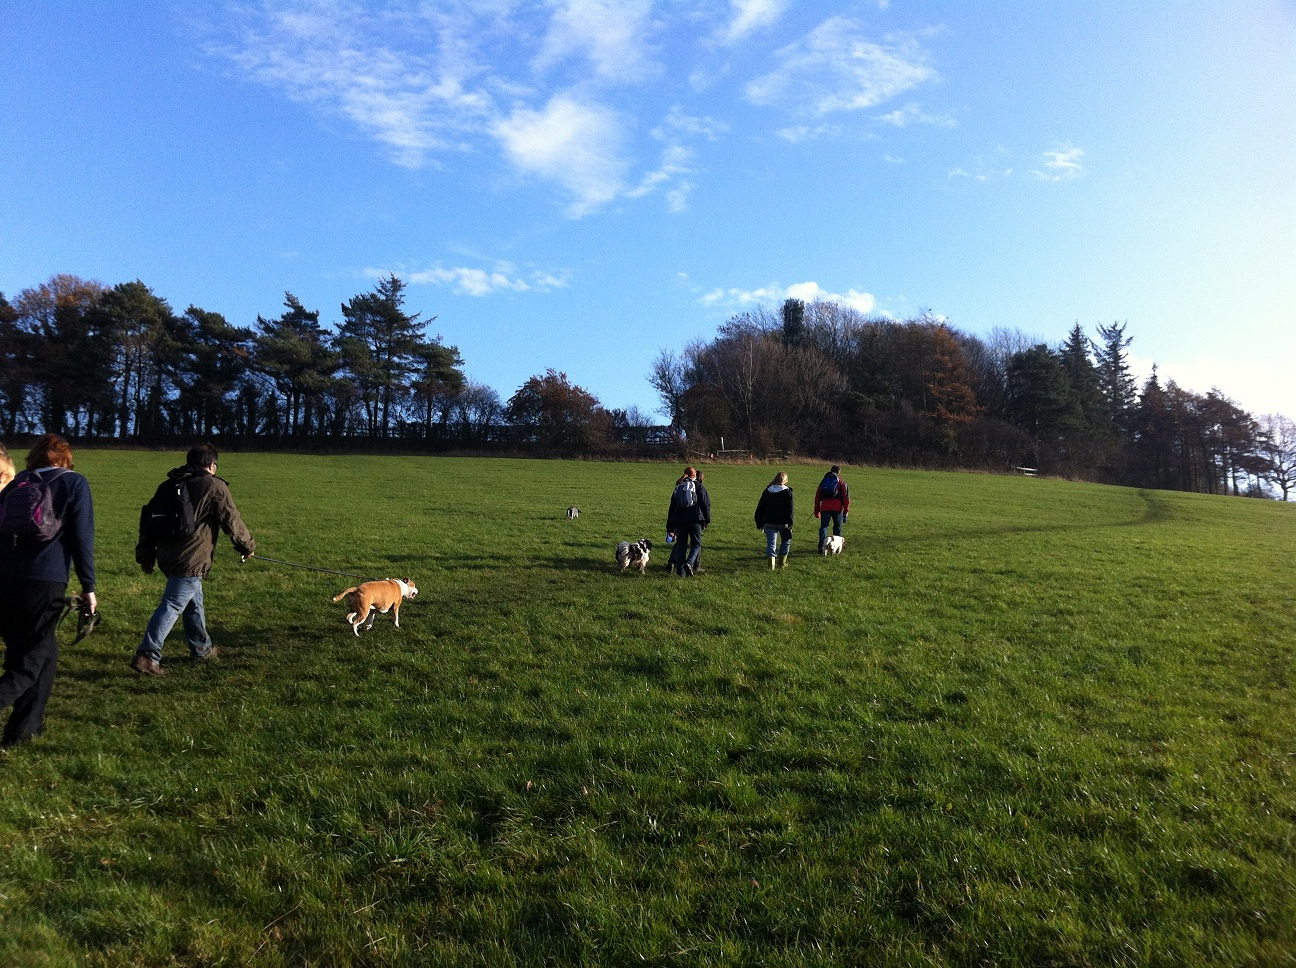 Sheffield Dog Walking Group